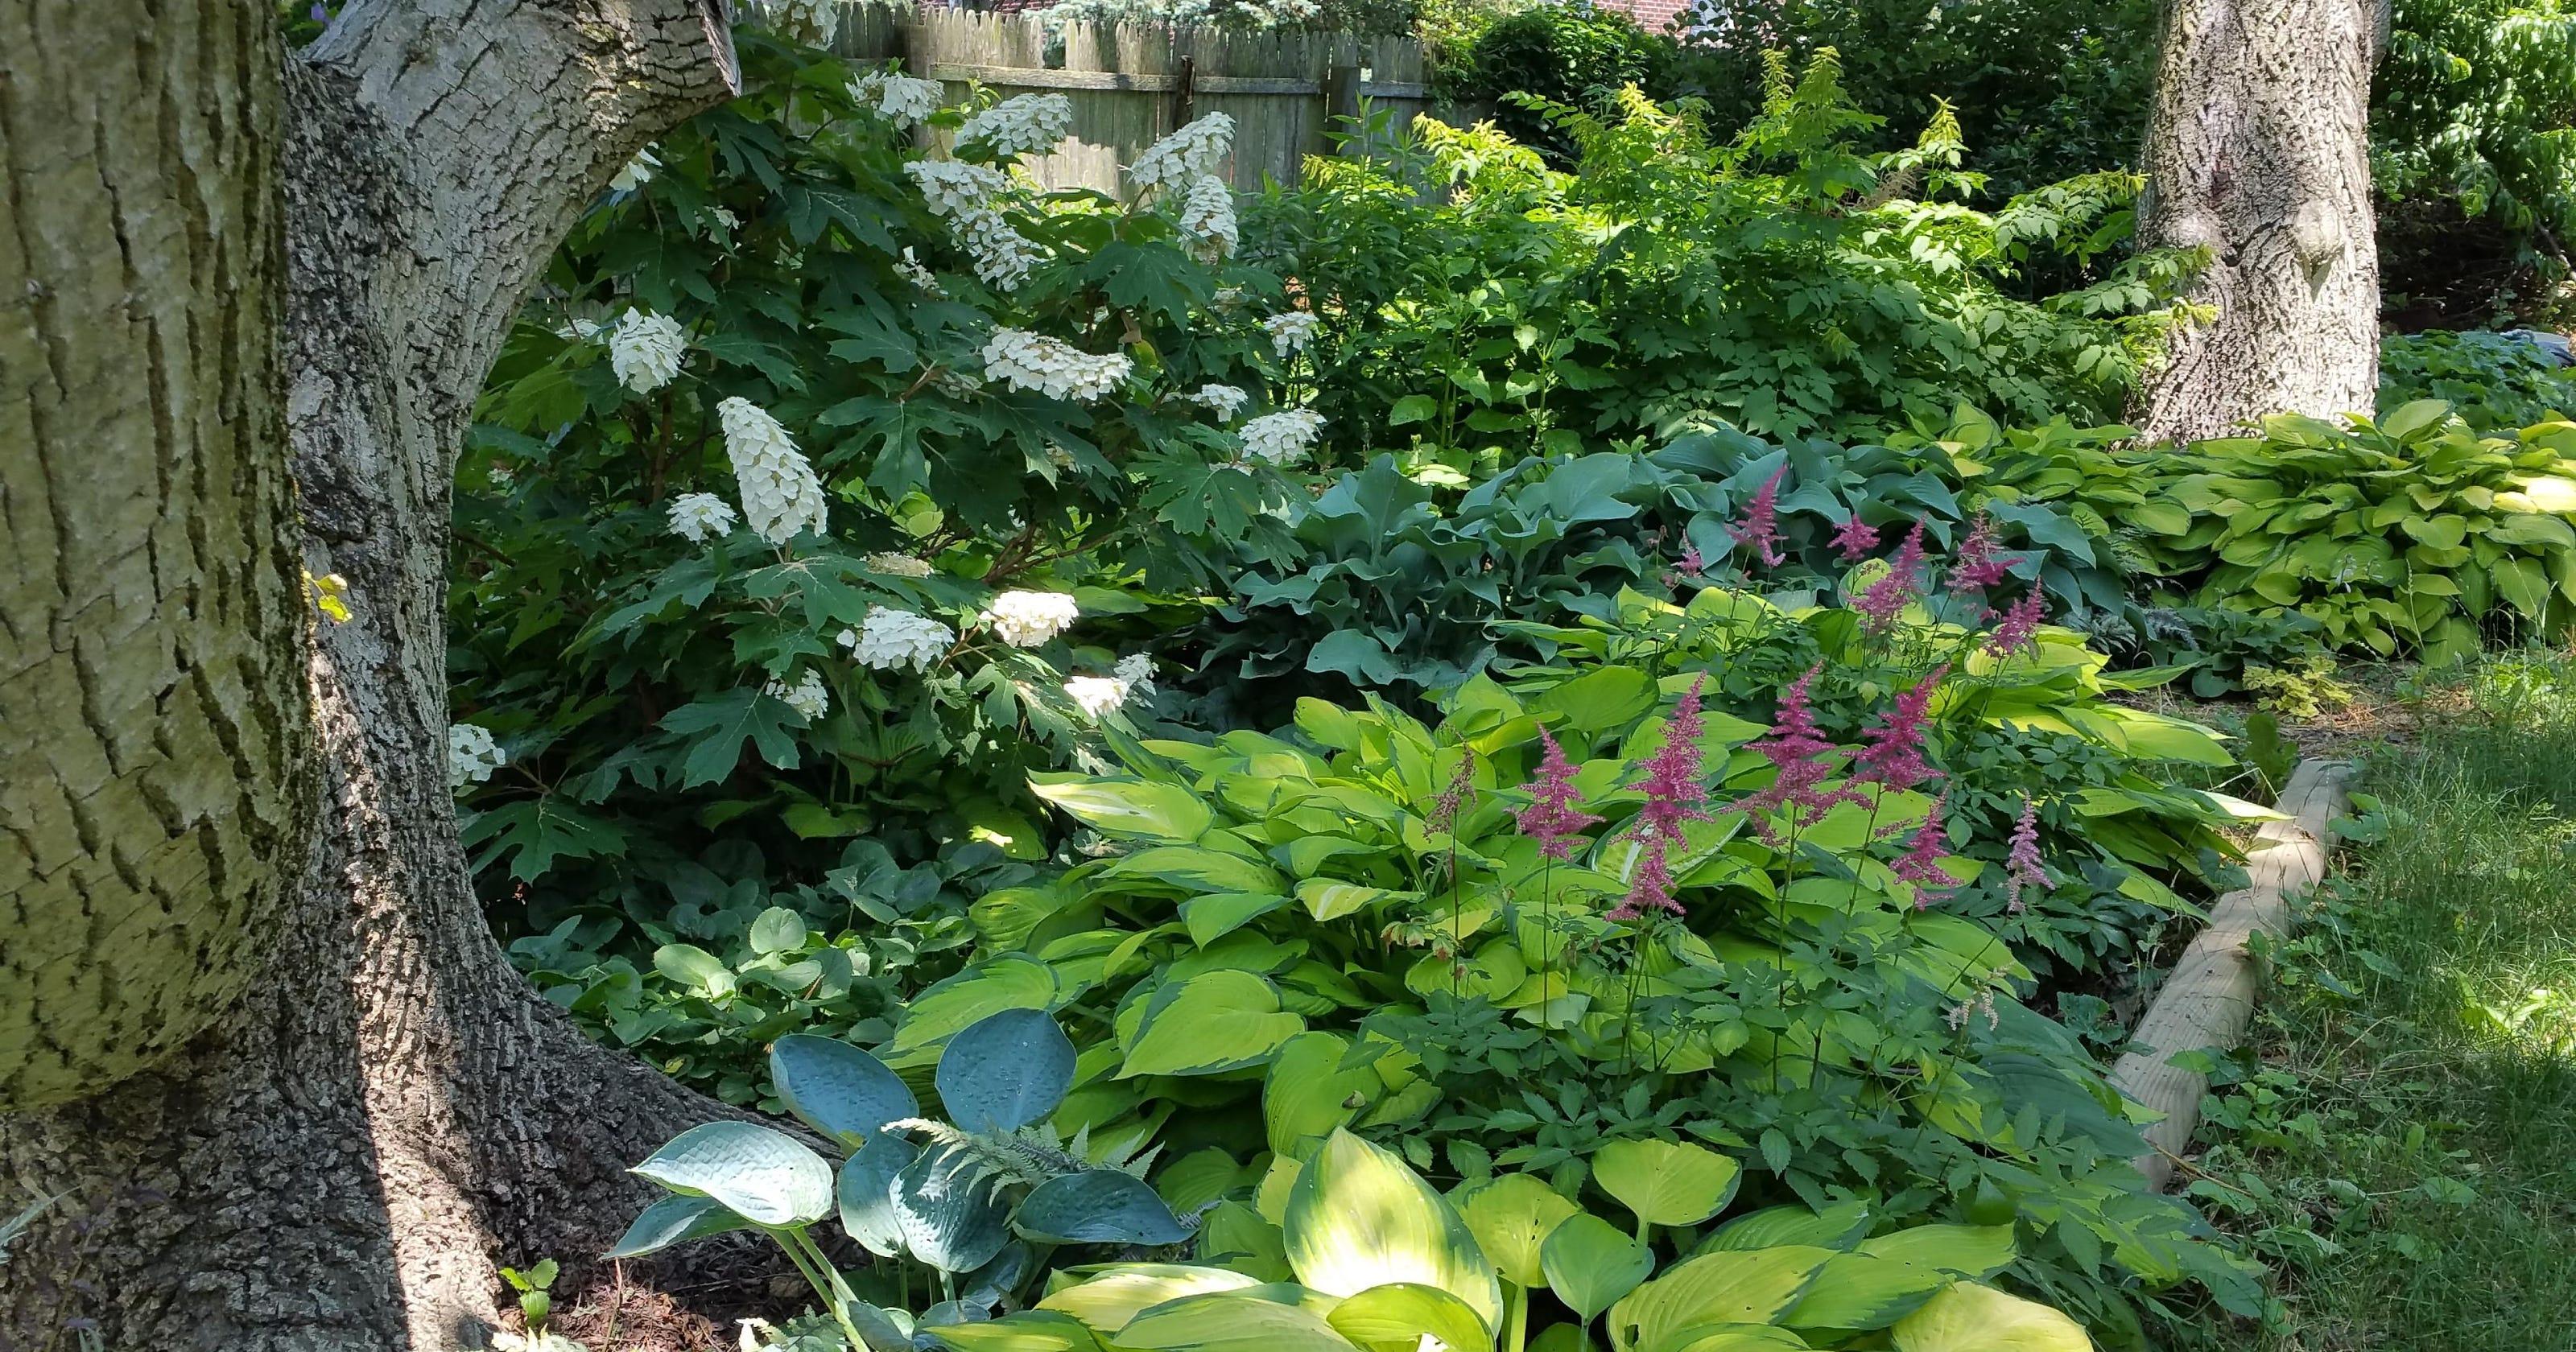 Gardening For Shade Work Area Raises More Than Hostas